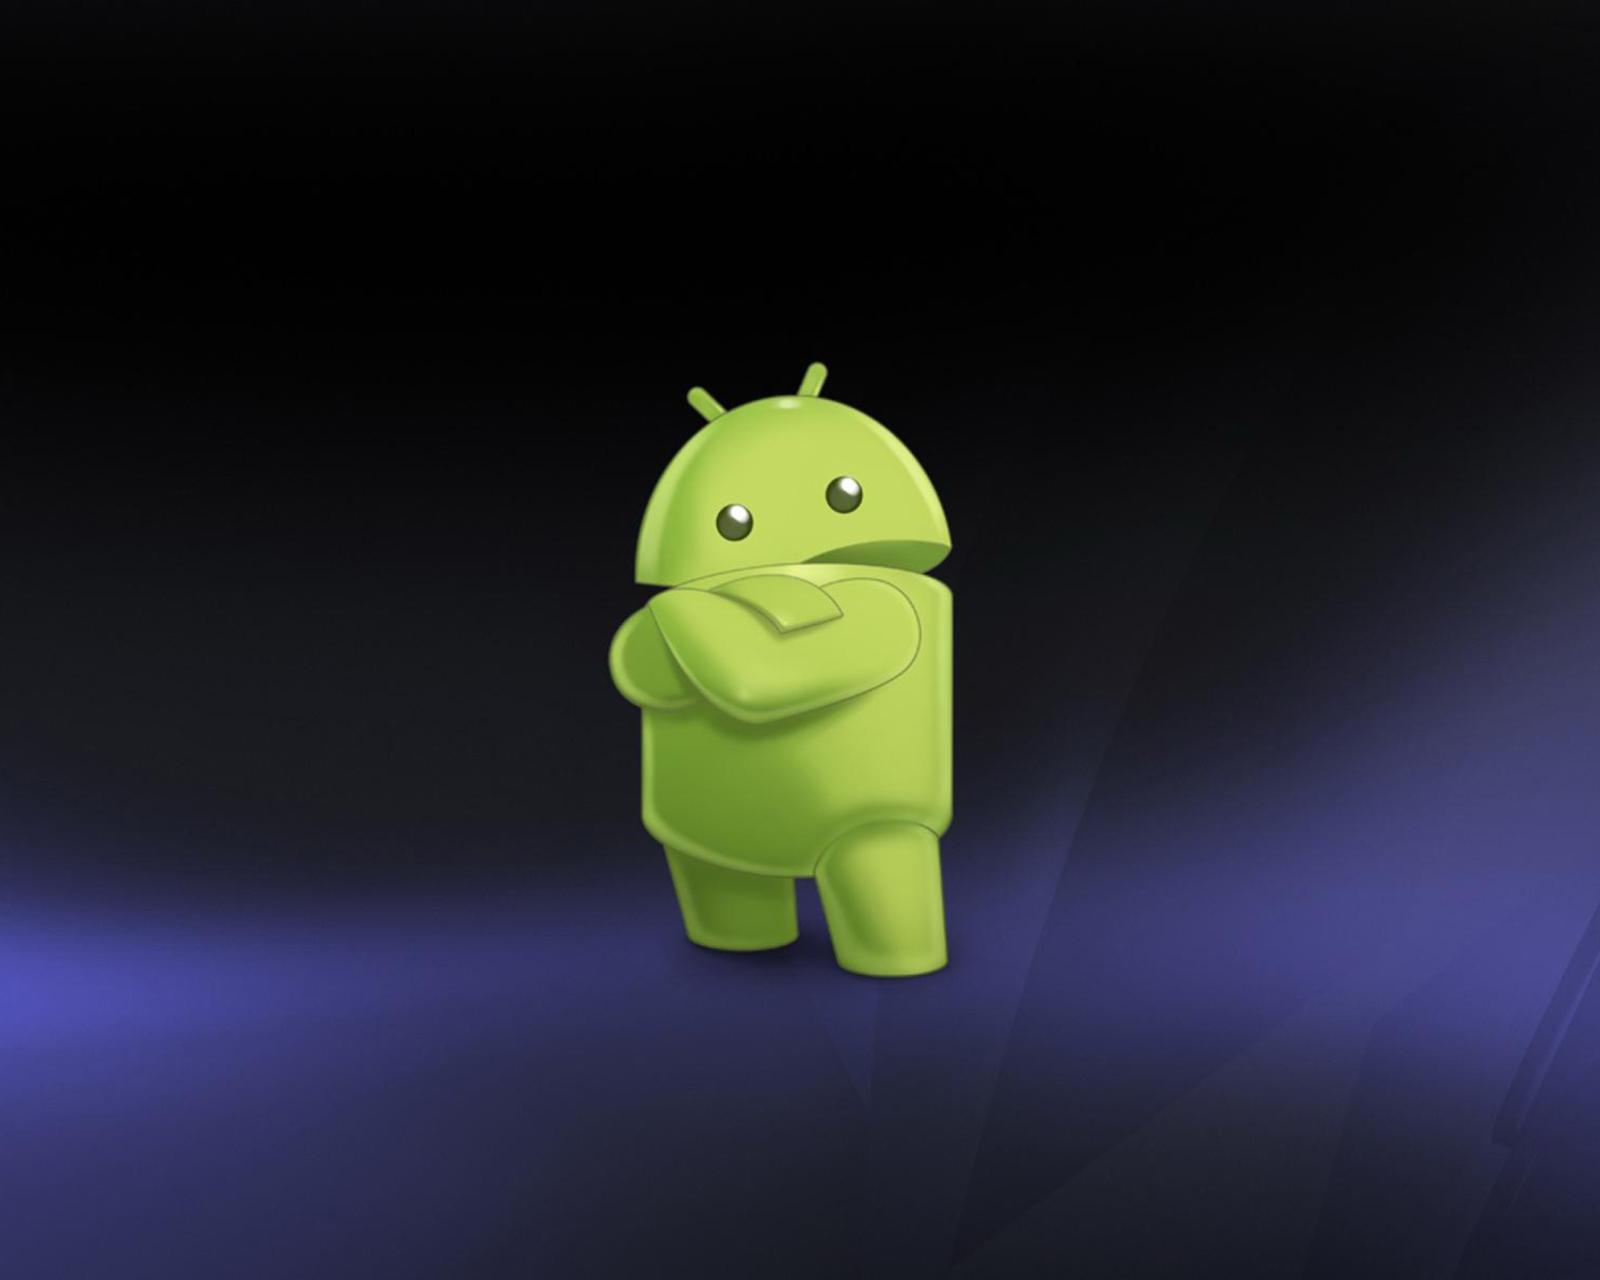 Картинки андроид на весь икран